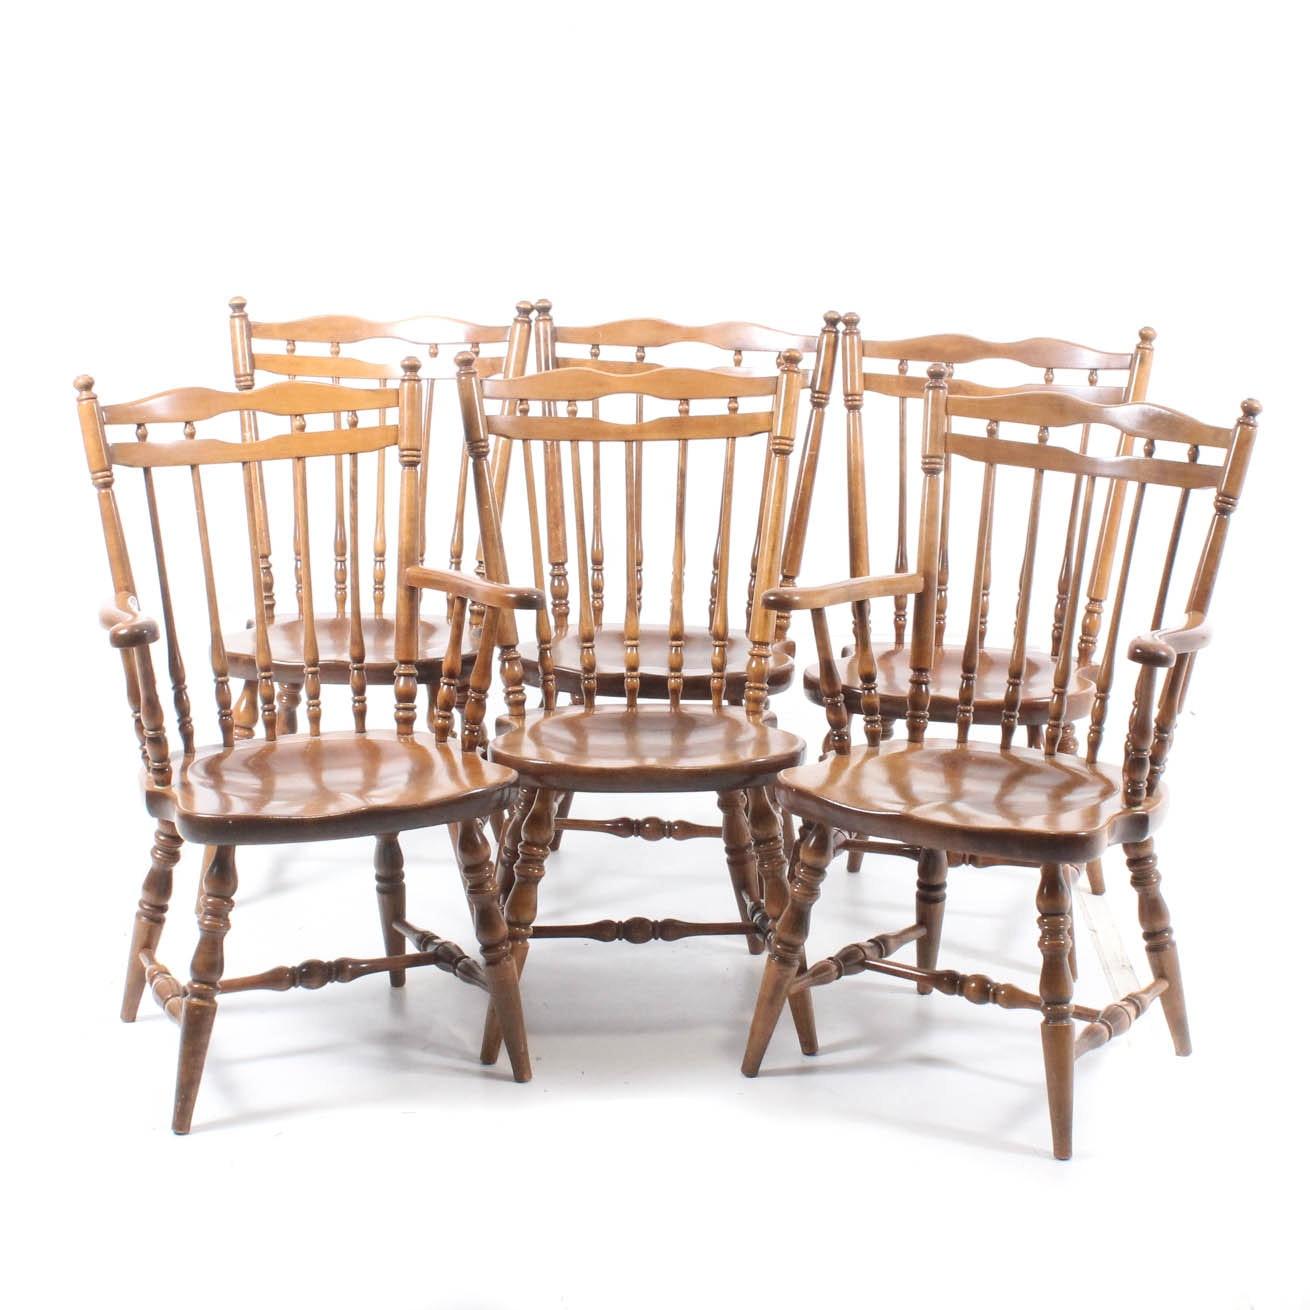 Nichols & Stone Dining Chairs